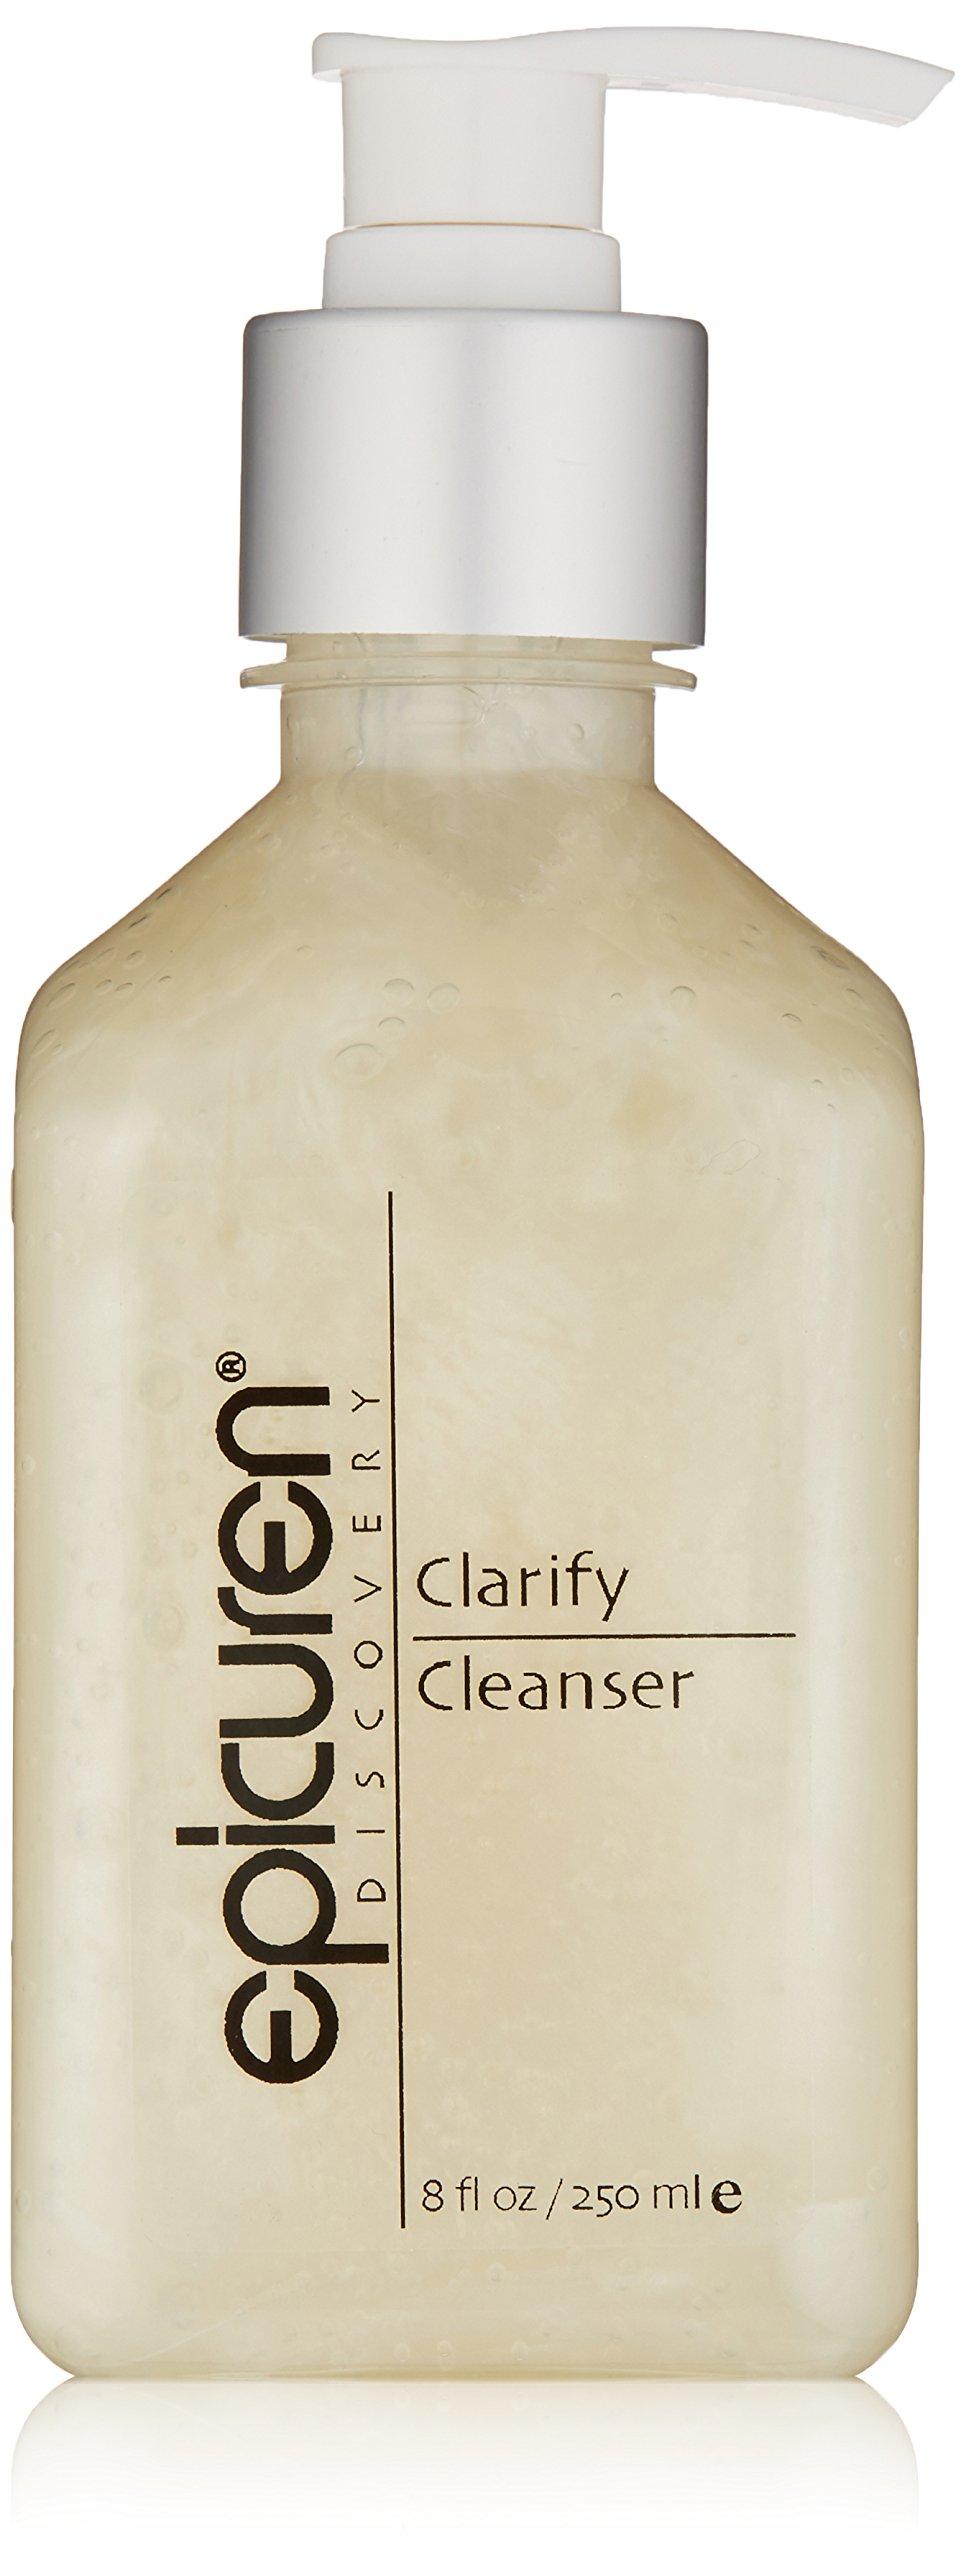 Epicuren Discovery Clarify Cleanser, 8 oz.